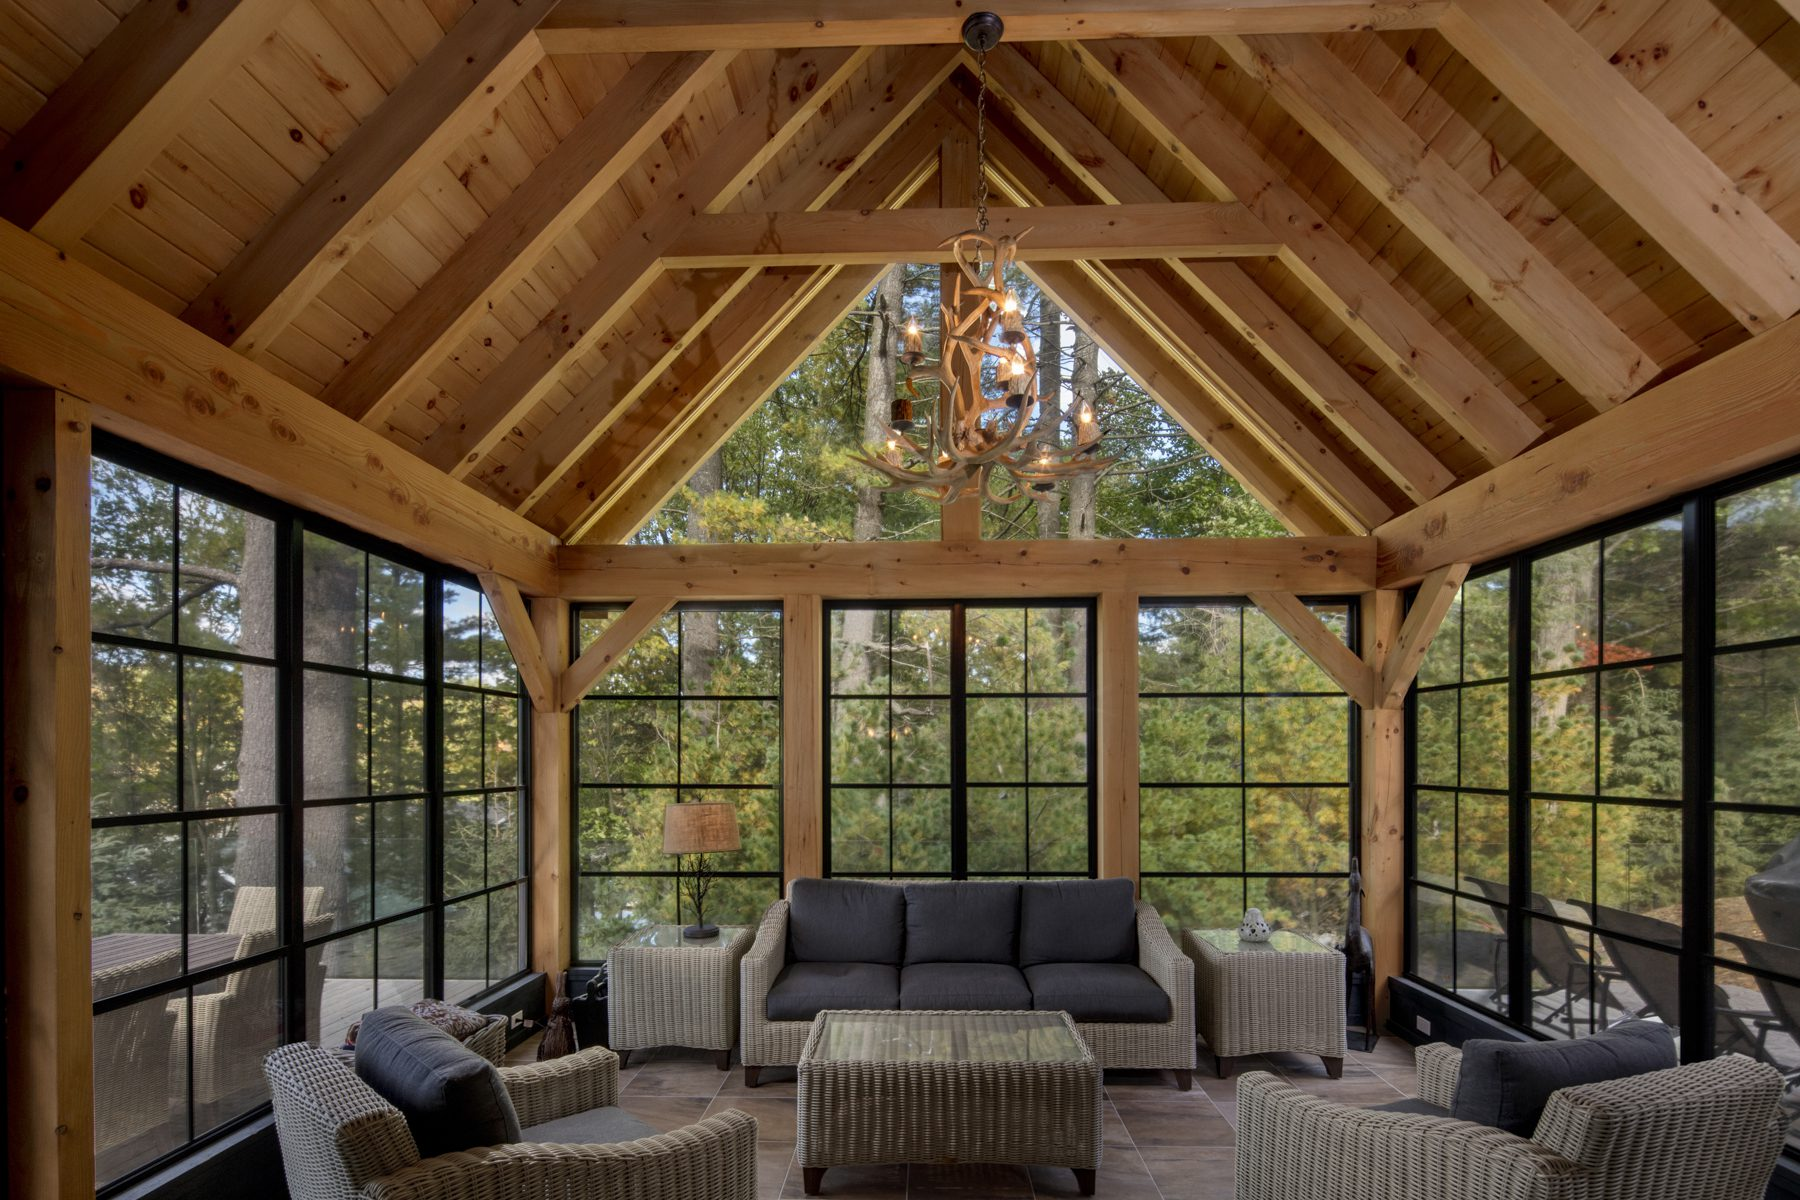 Normerica Timber Frame, Interior, Cottage, Muskoka Room, Screened Porch